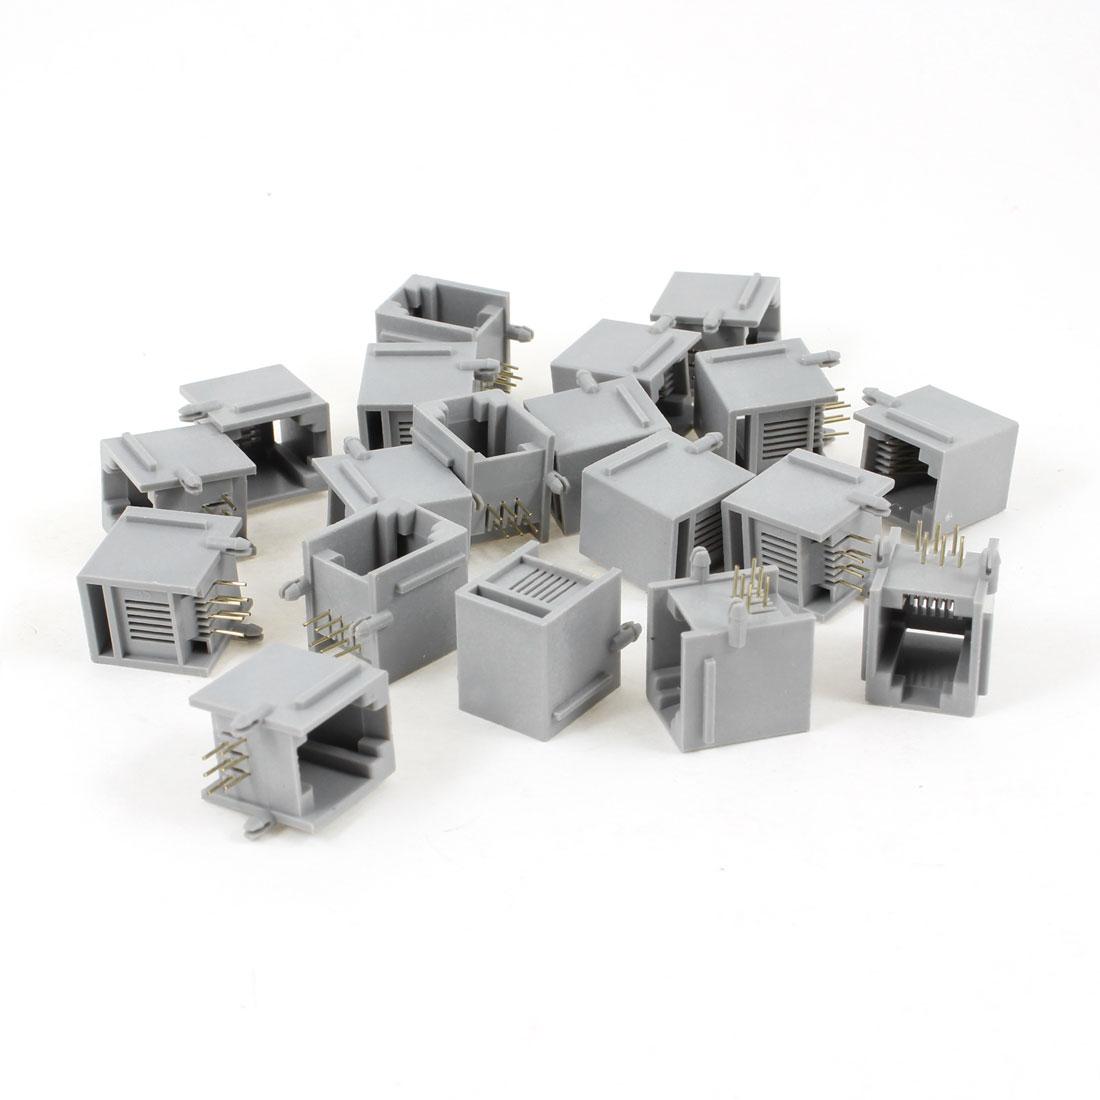 19 Pcs Gray Plastic RJ12 6P6C 6 Round Pin Network Modular PCB Connector Jacks